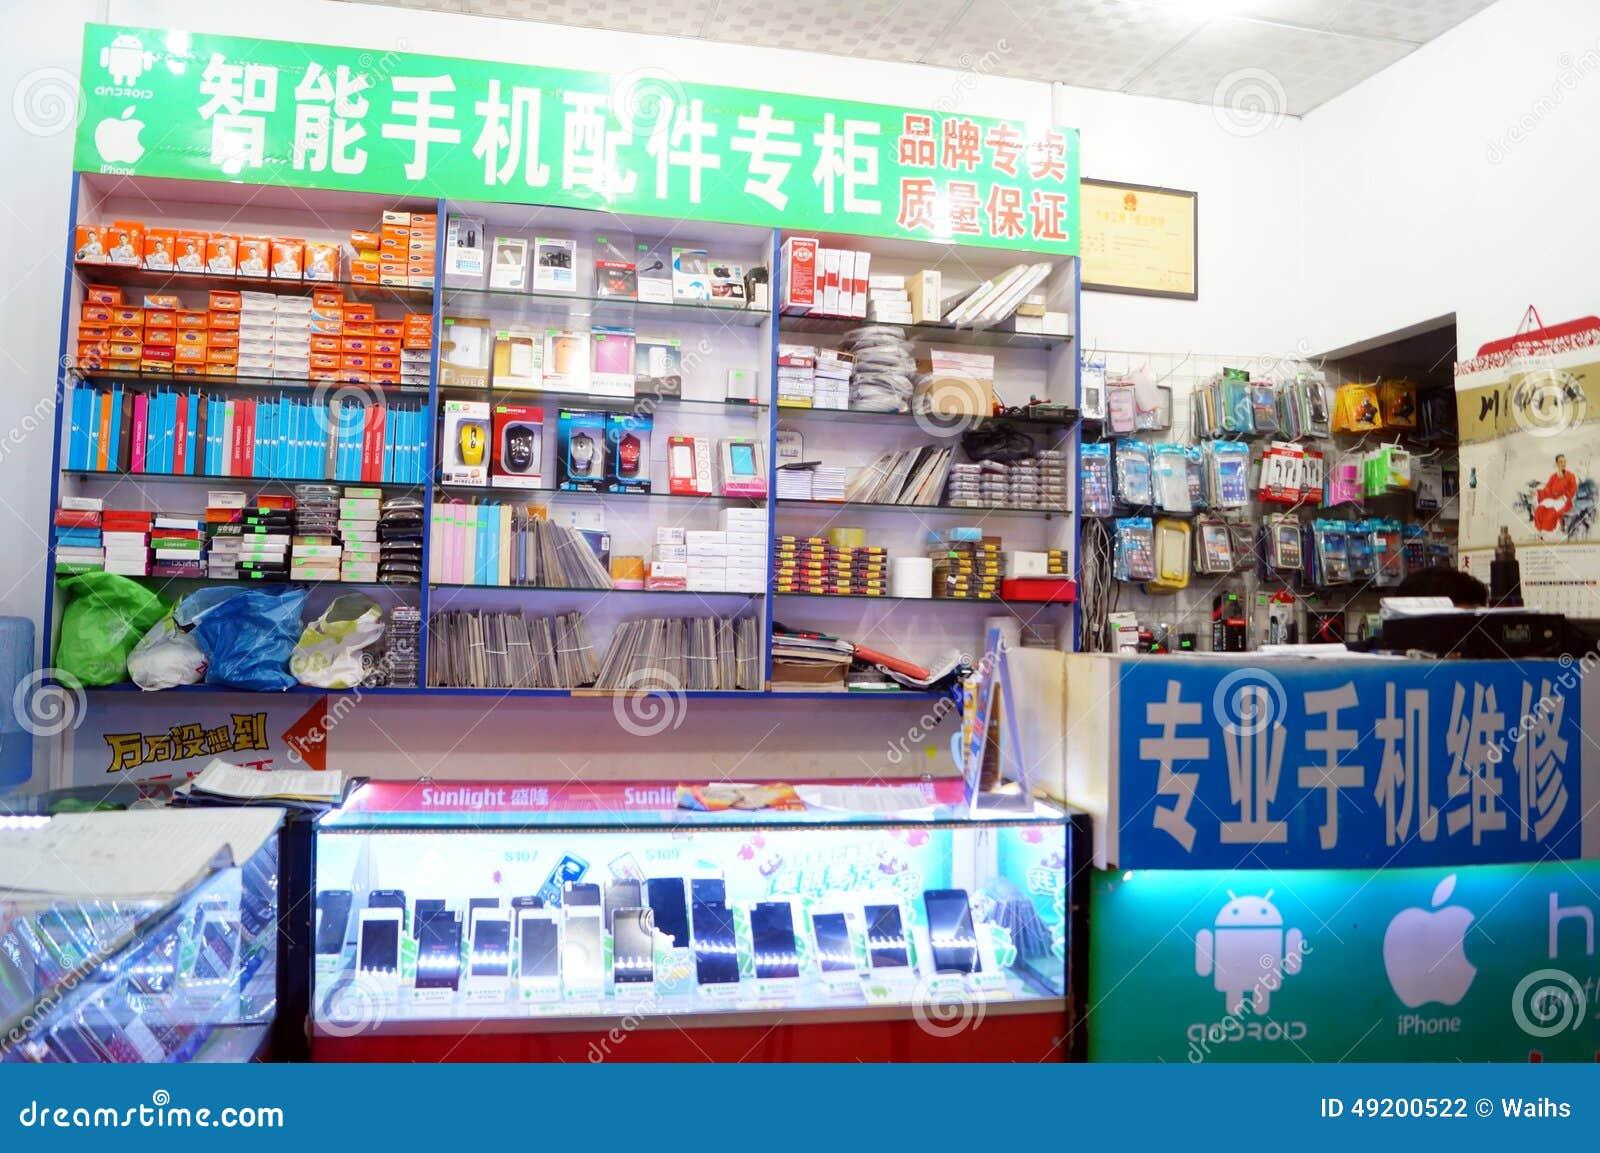 Shenzhen, China: Mobile Phone Shop Stock Photo 49200522 - Megapixl